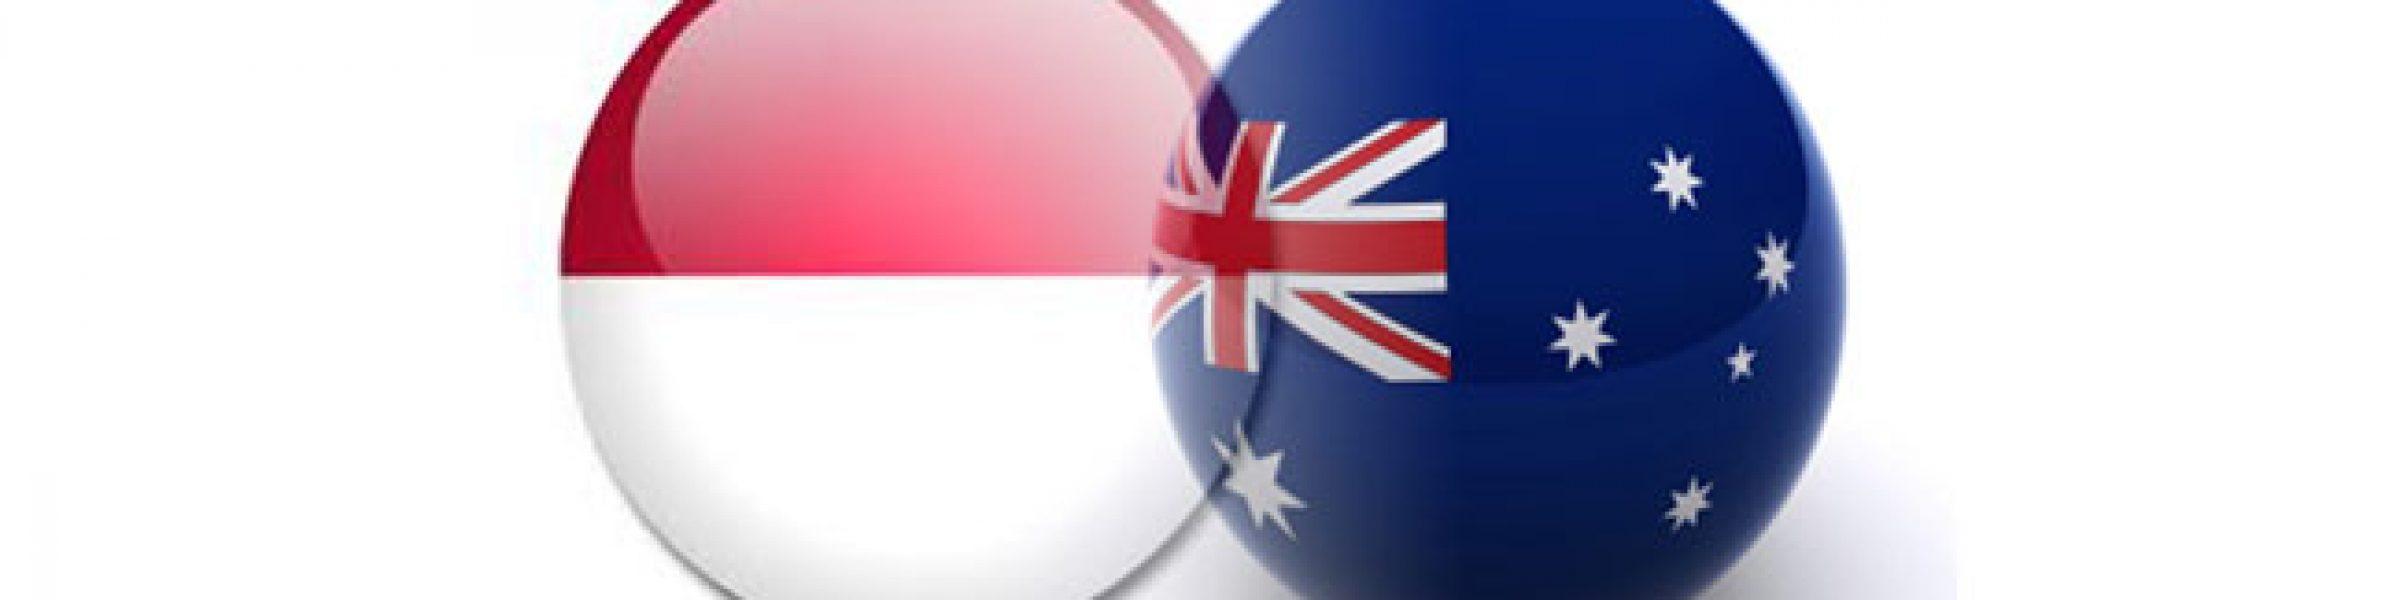 Australia-Indonesia free trade agreement